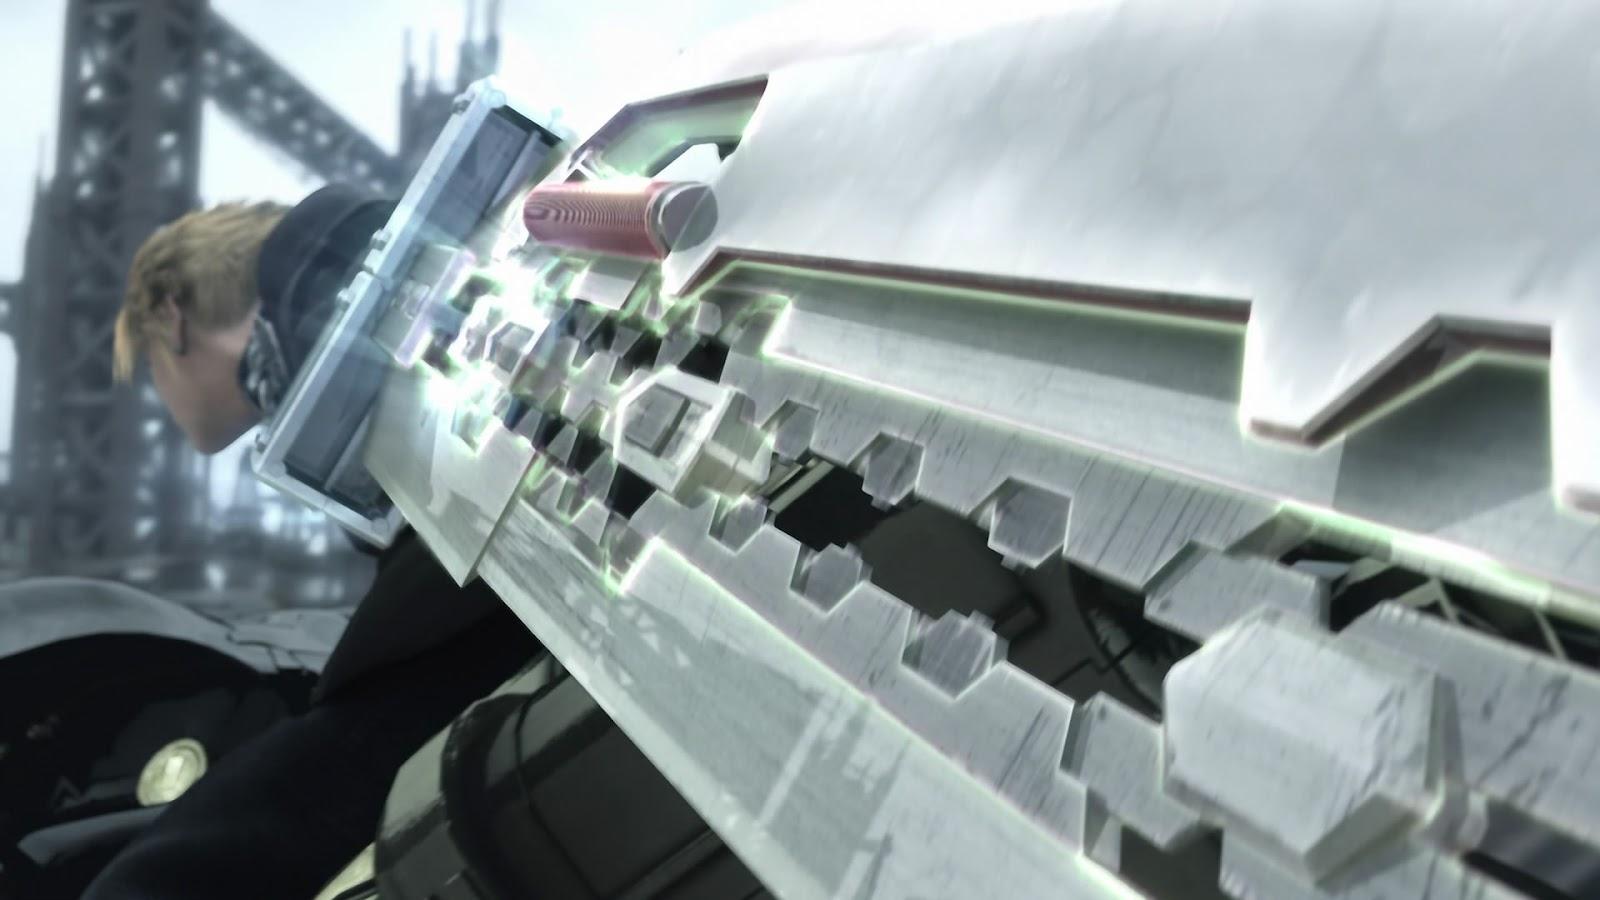 FinalFantasyVIIwallpapers Final Fantasy VII Wallpapers in HD 1080p 1600x900